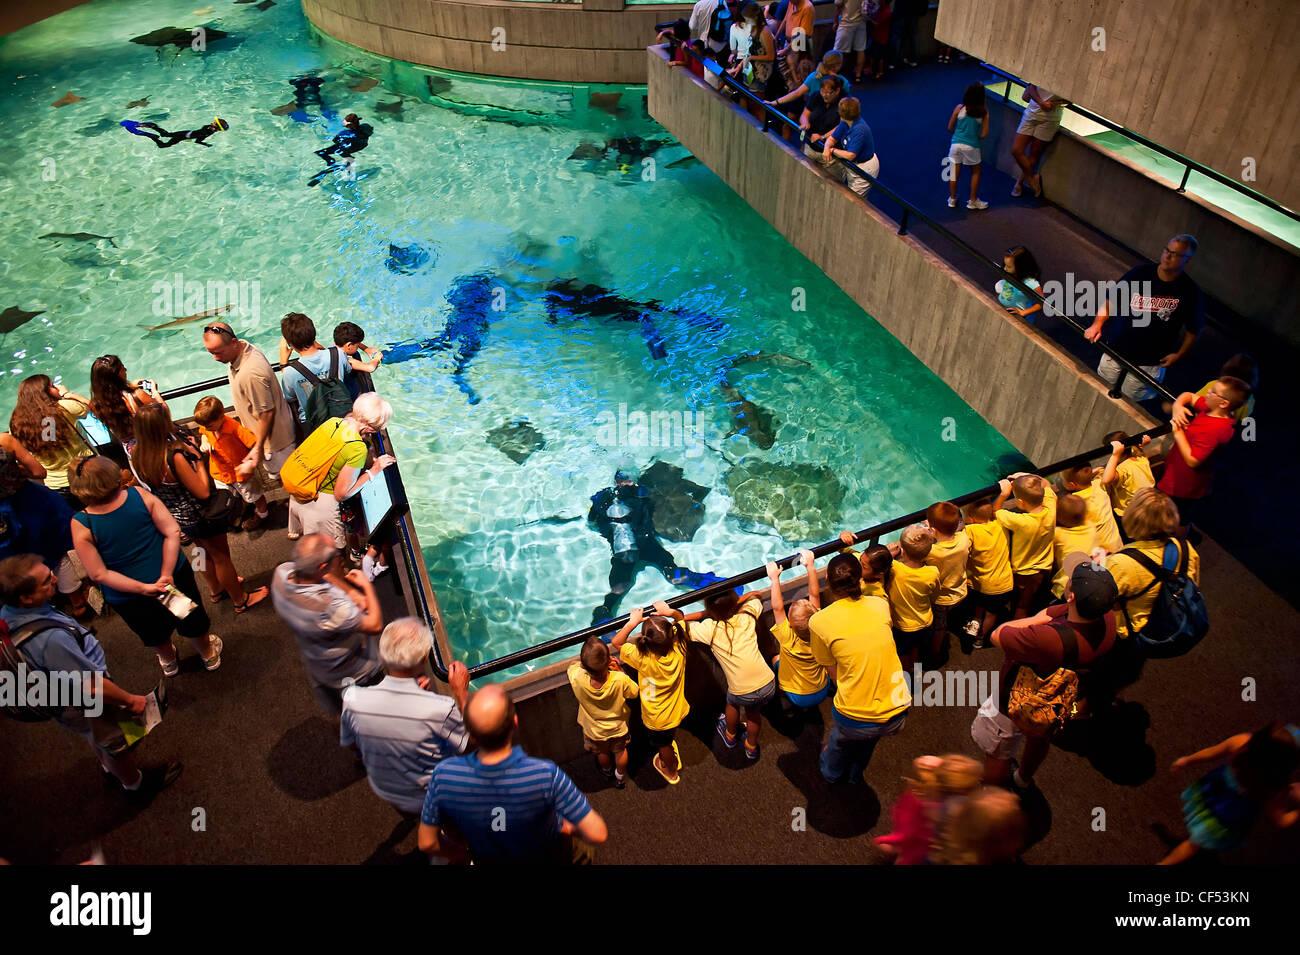 L'aquarium national, inner harbor, Baltimore, Maryland, USA Photo Stock